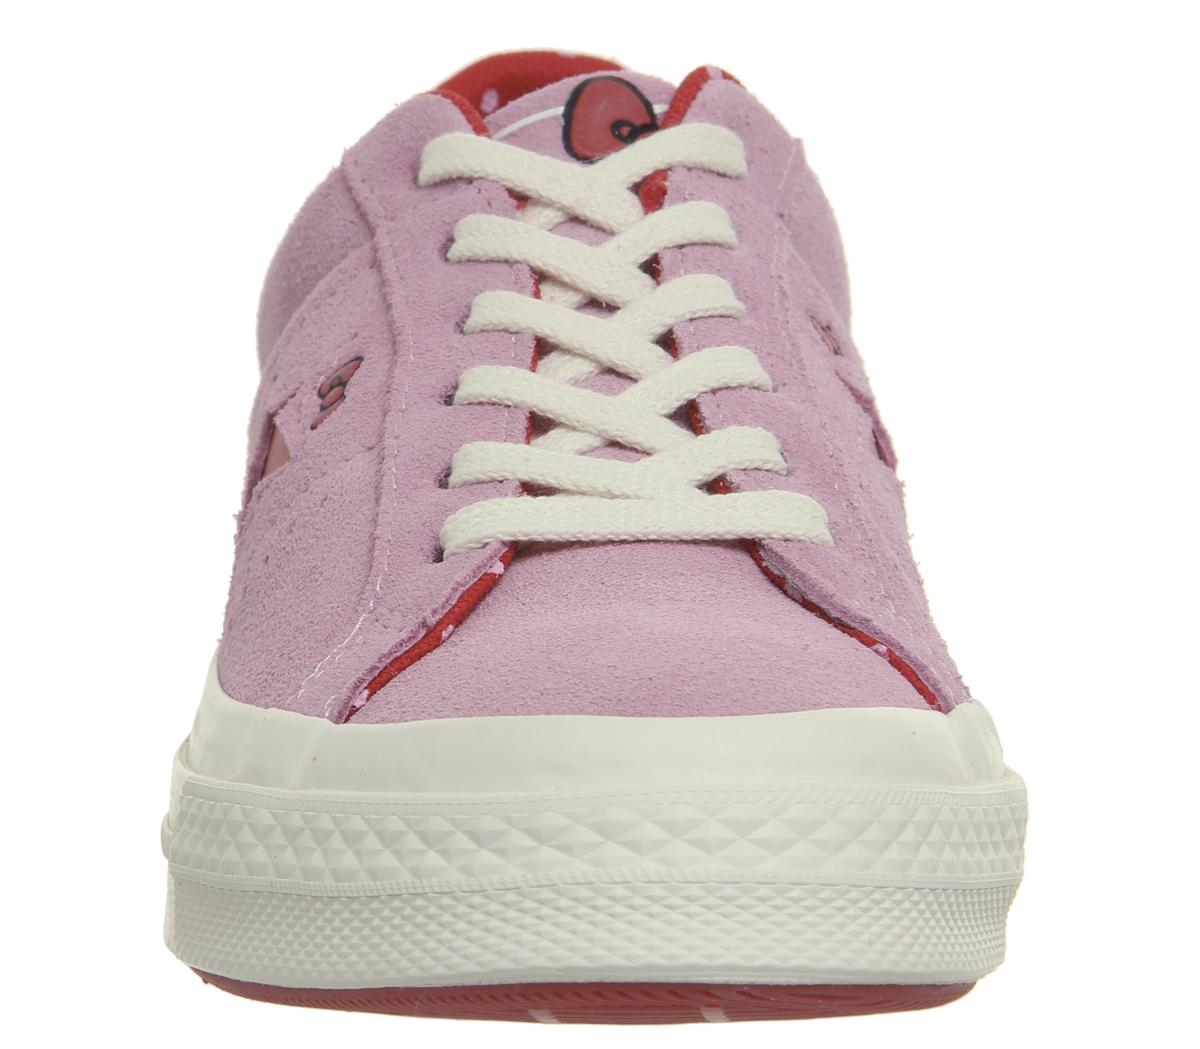 Damenschuhe Converse HELLO One Star Trainers PINK HELLO Converse KITTY Trainers Schuhes b47f1a